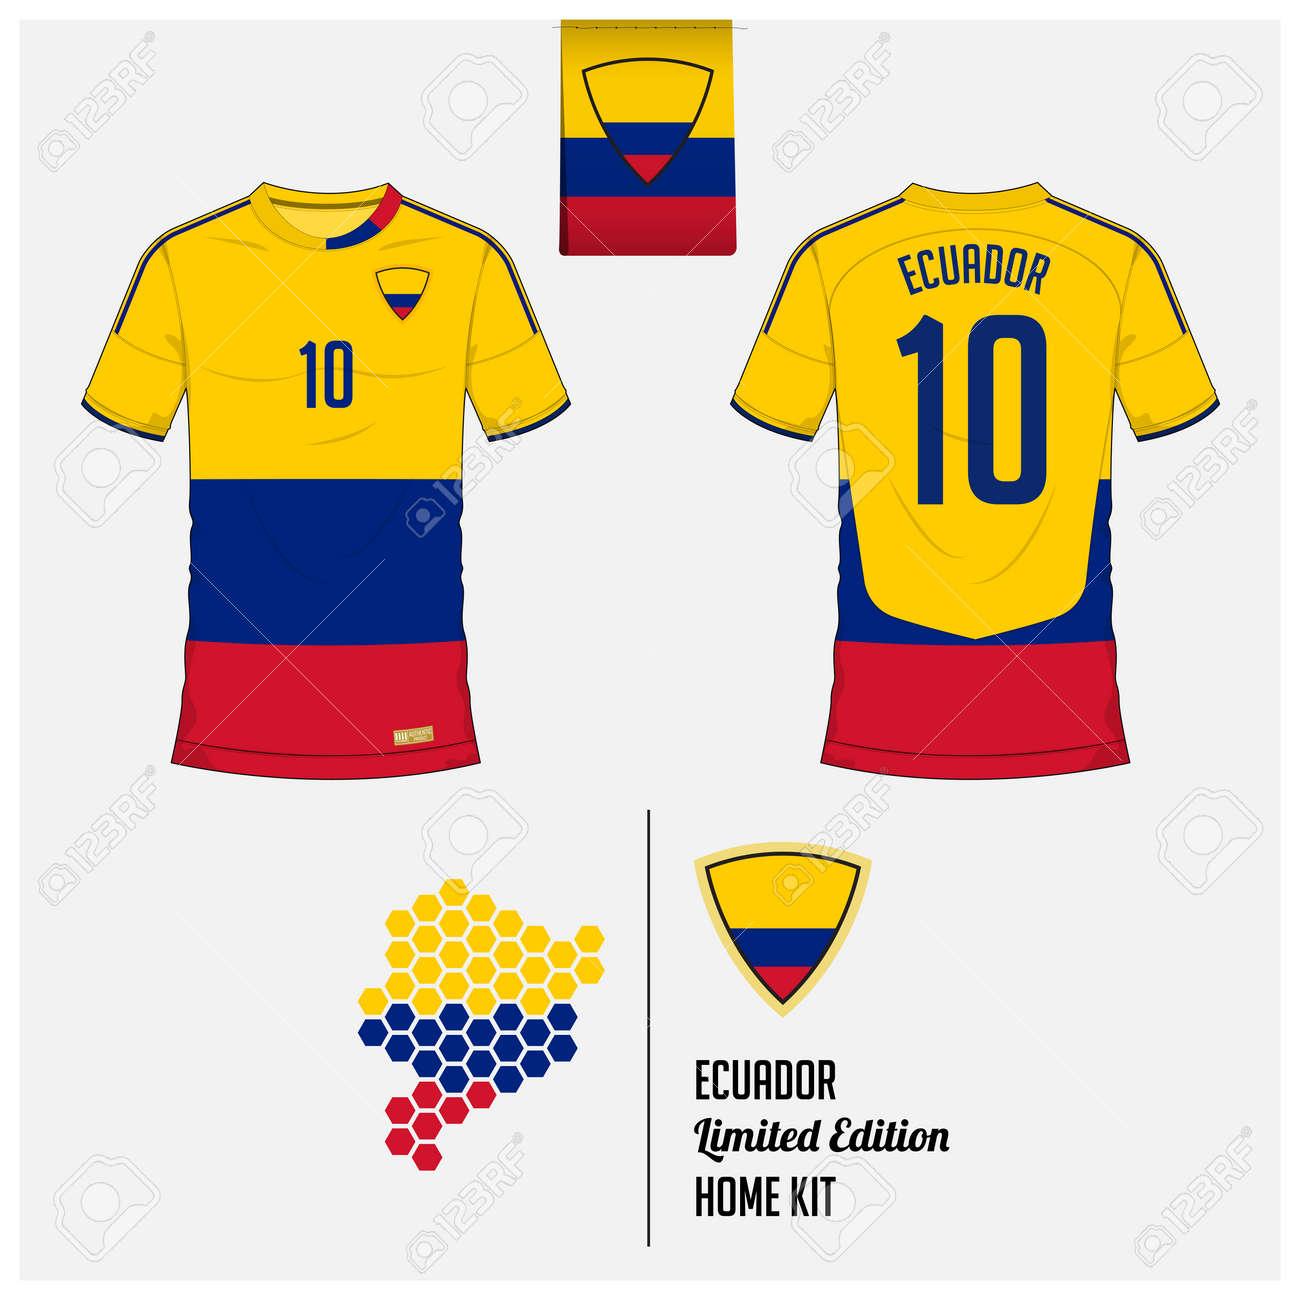 c3b5c735fc1 Soccer Jersey Or Football Kit